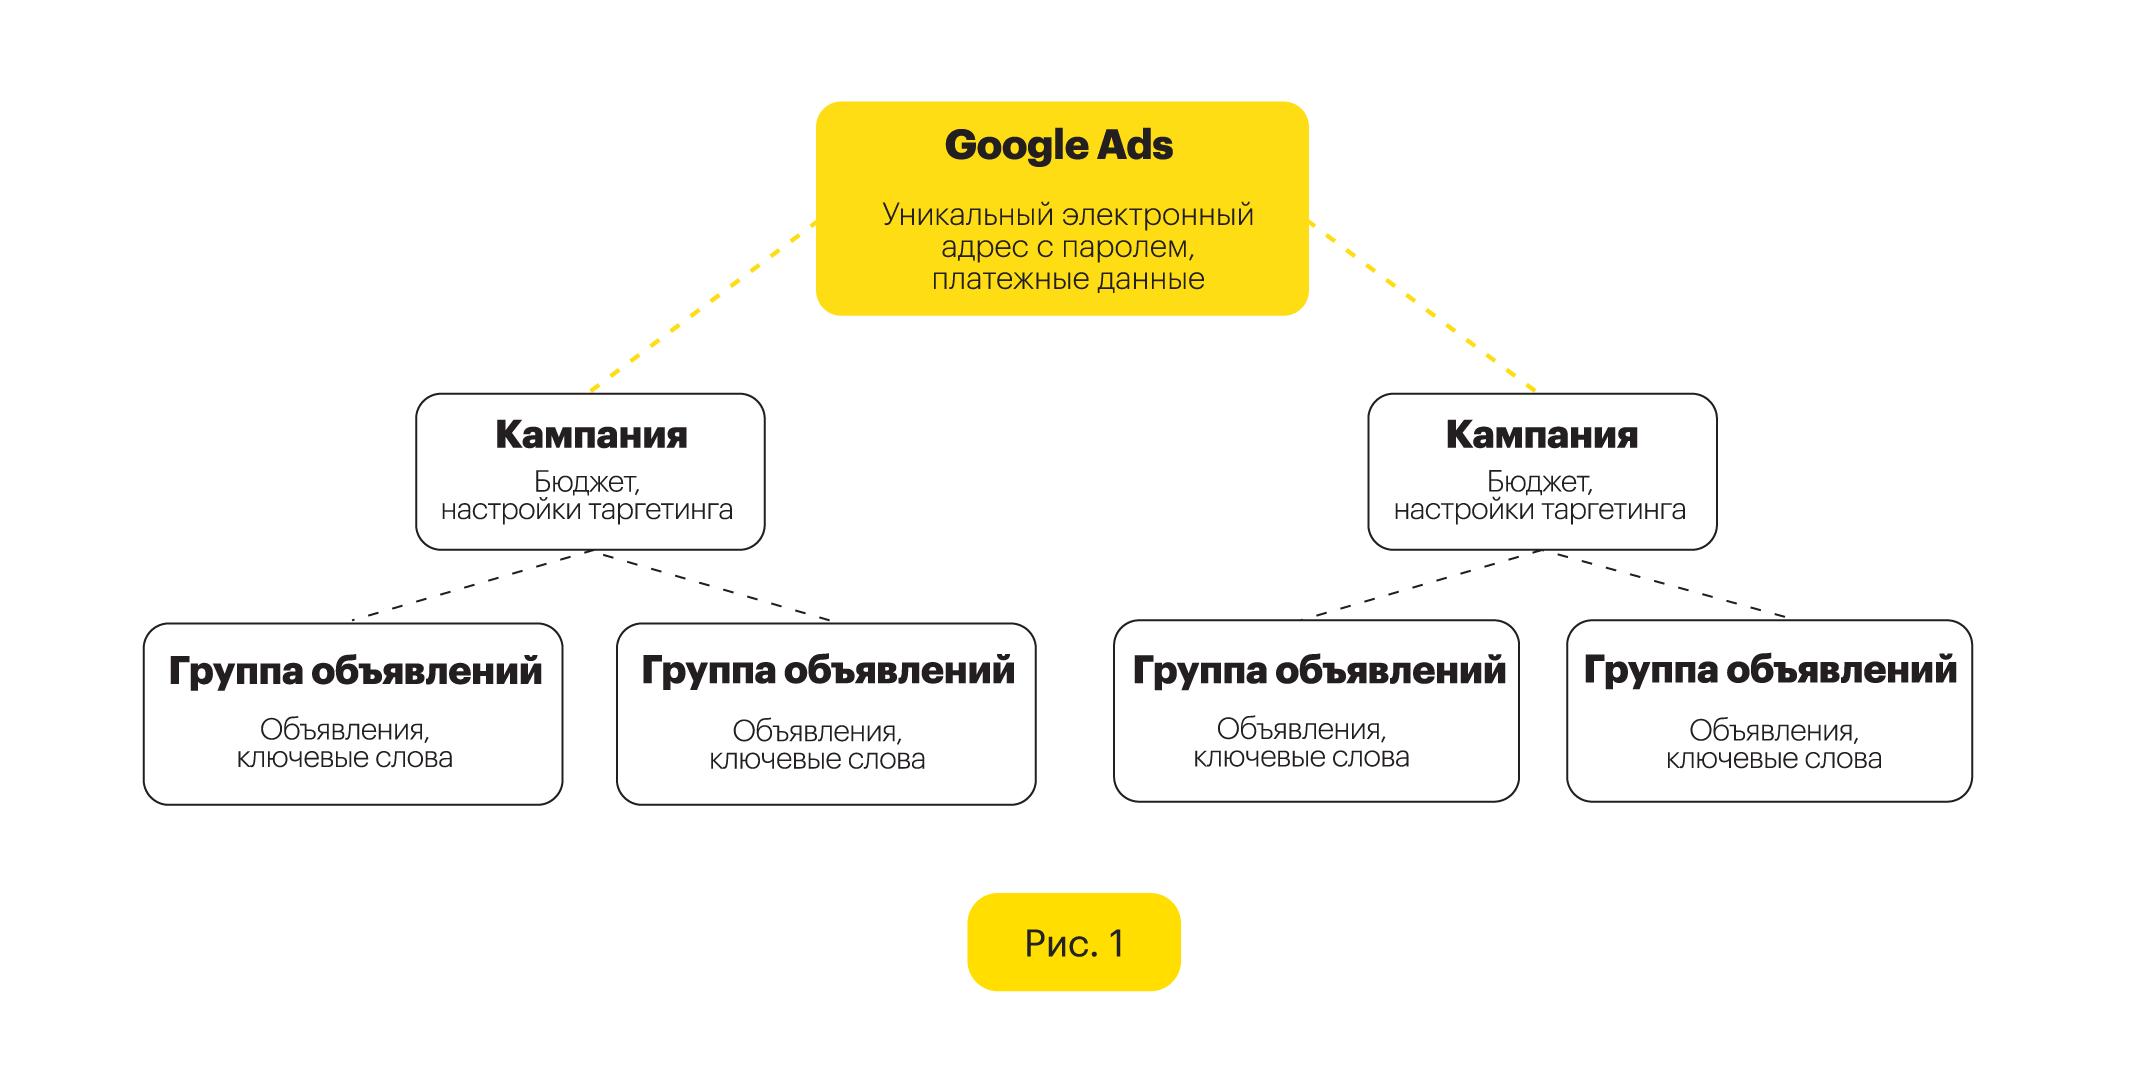 Структура аккаунта Google Ads